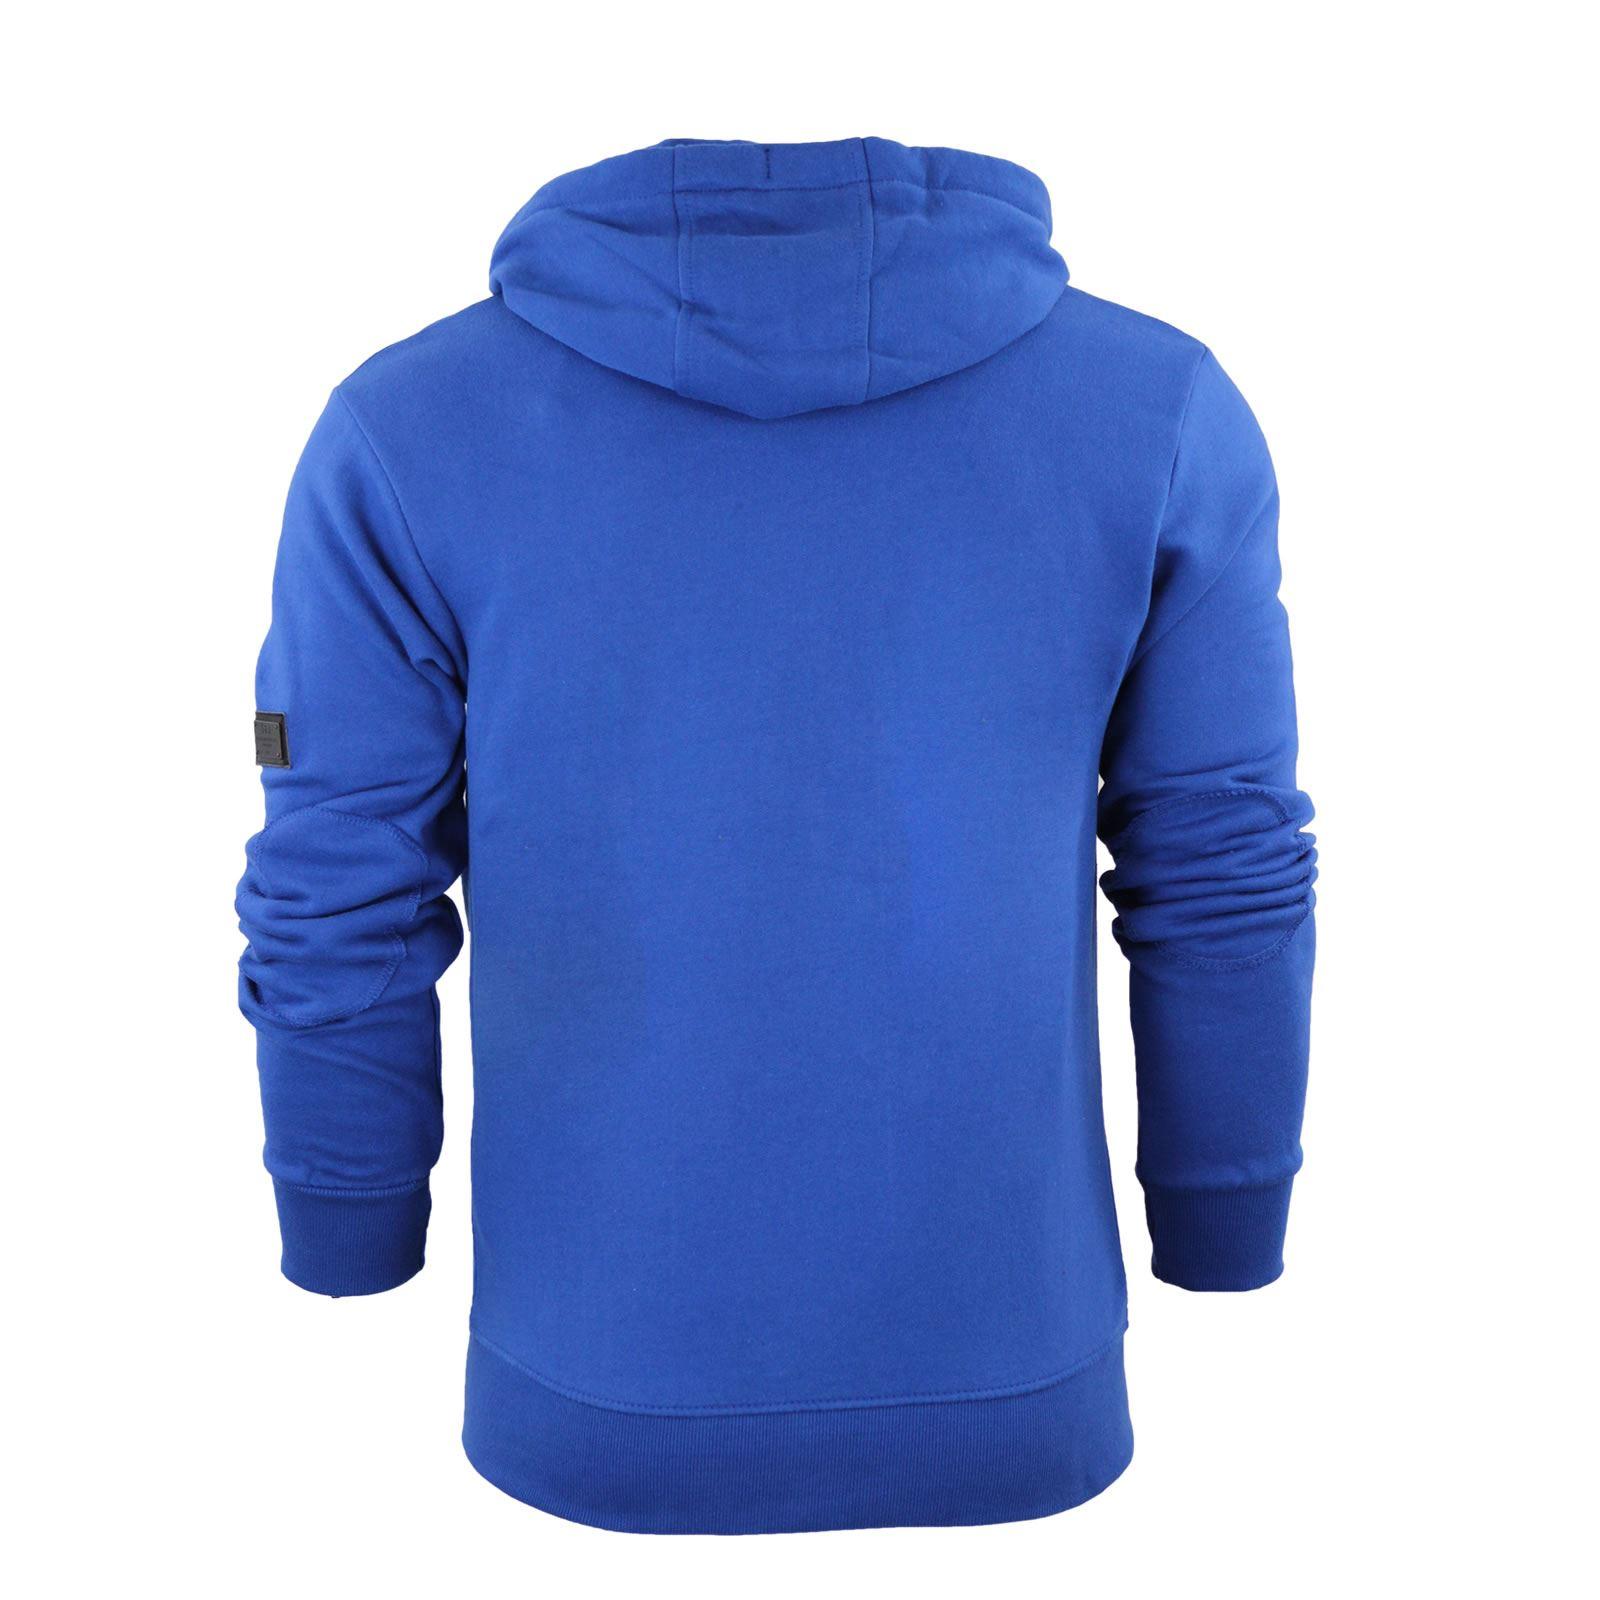 Mens-Hoodie-Smith-amp-Jones-Zip-Up-Hooded-Sweater-Jumper thumbnail 15